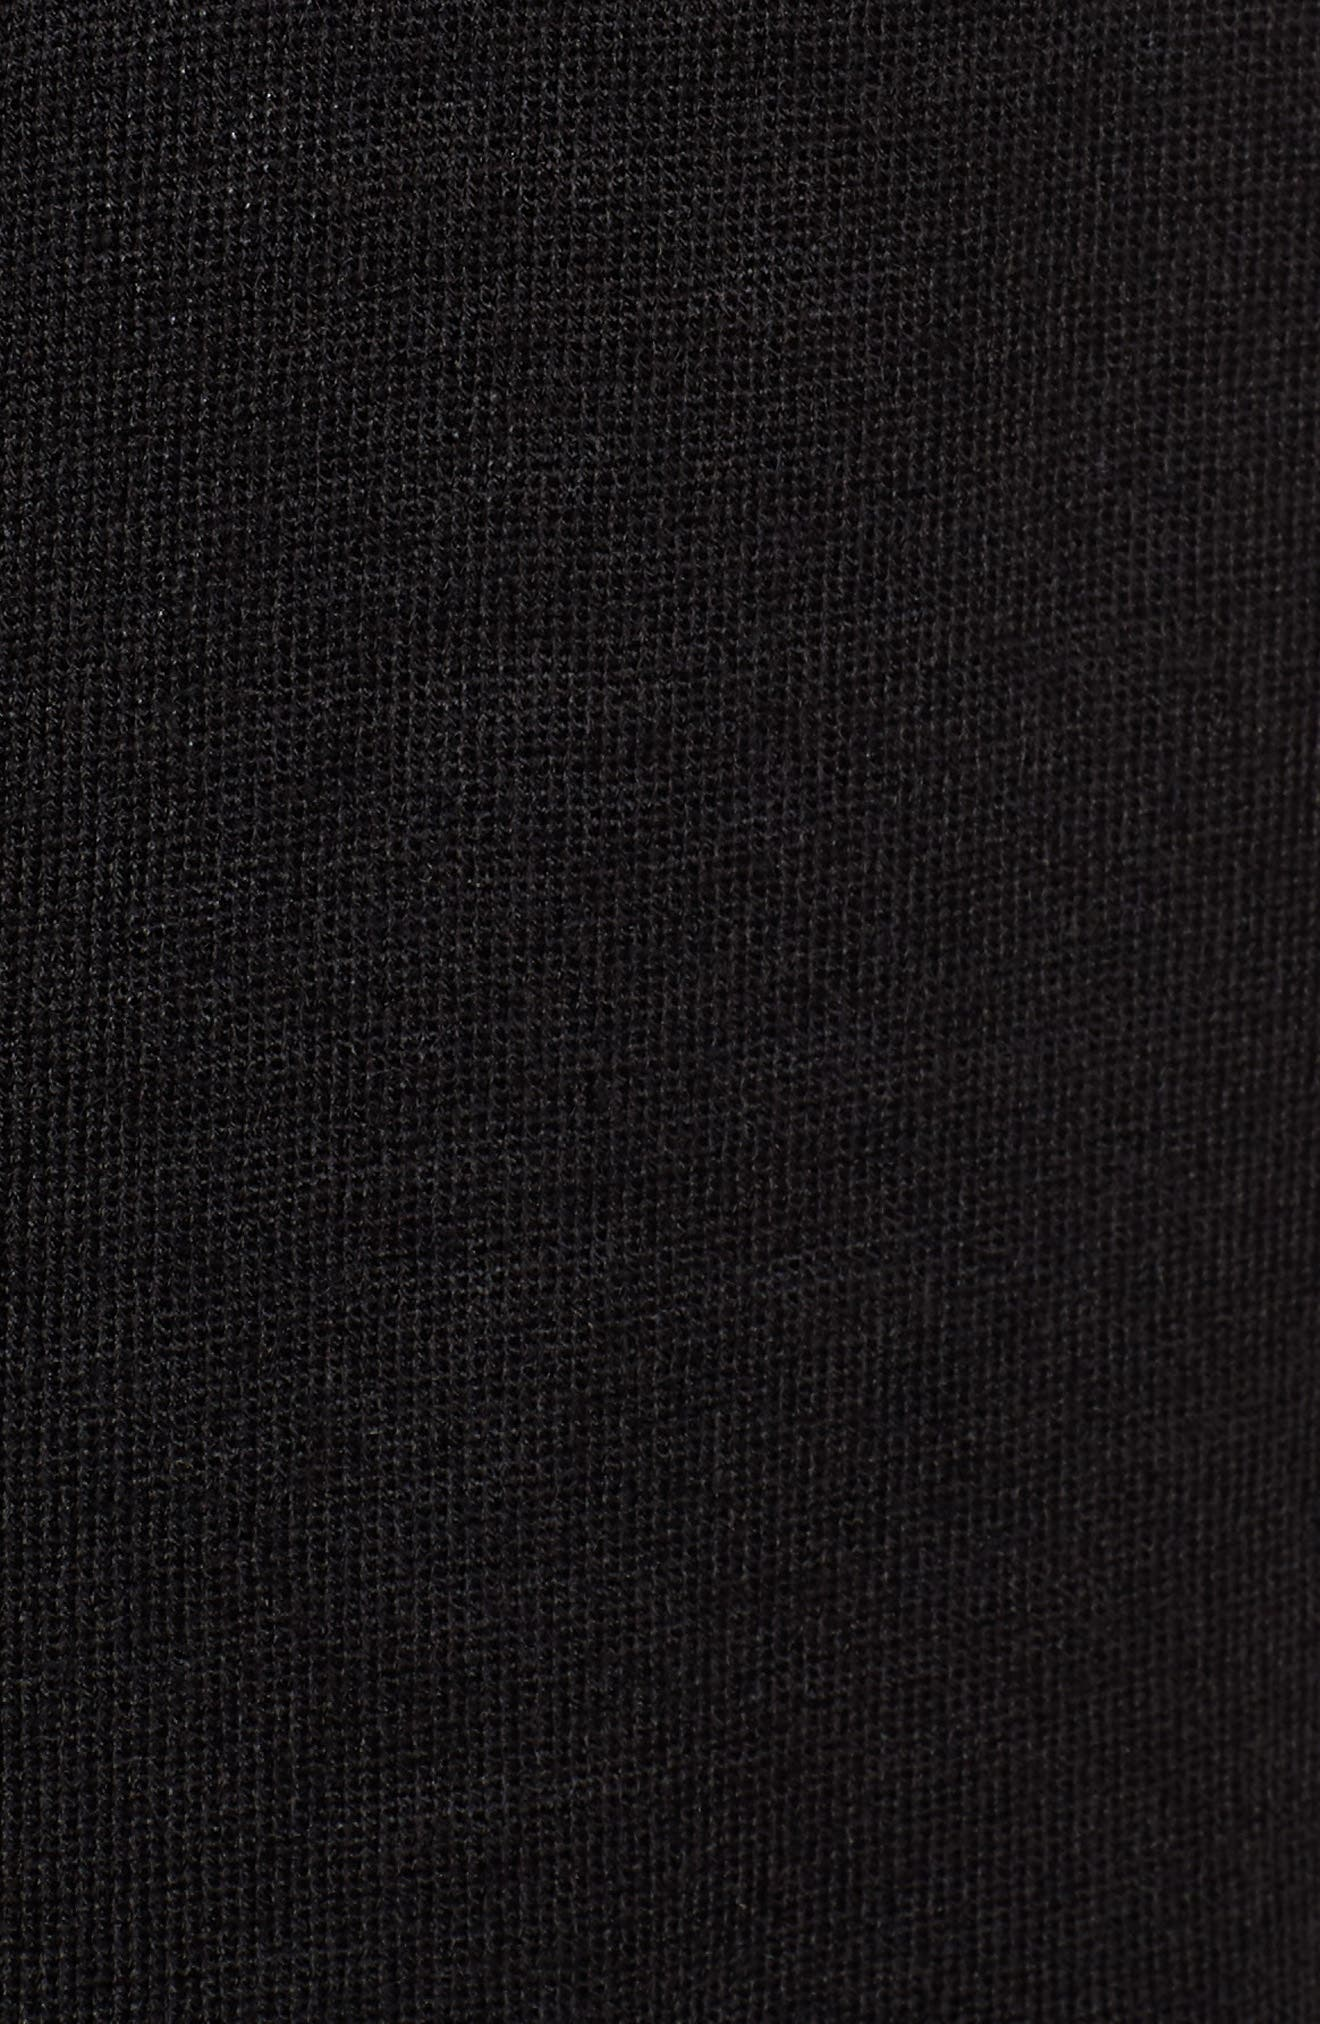 V-Neck Merino Wool Cardigan,                             Alternate thumbnail 5, color,                             BLACK